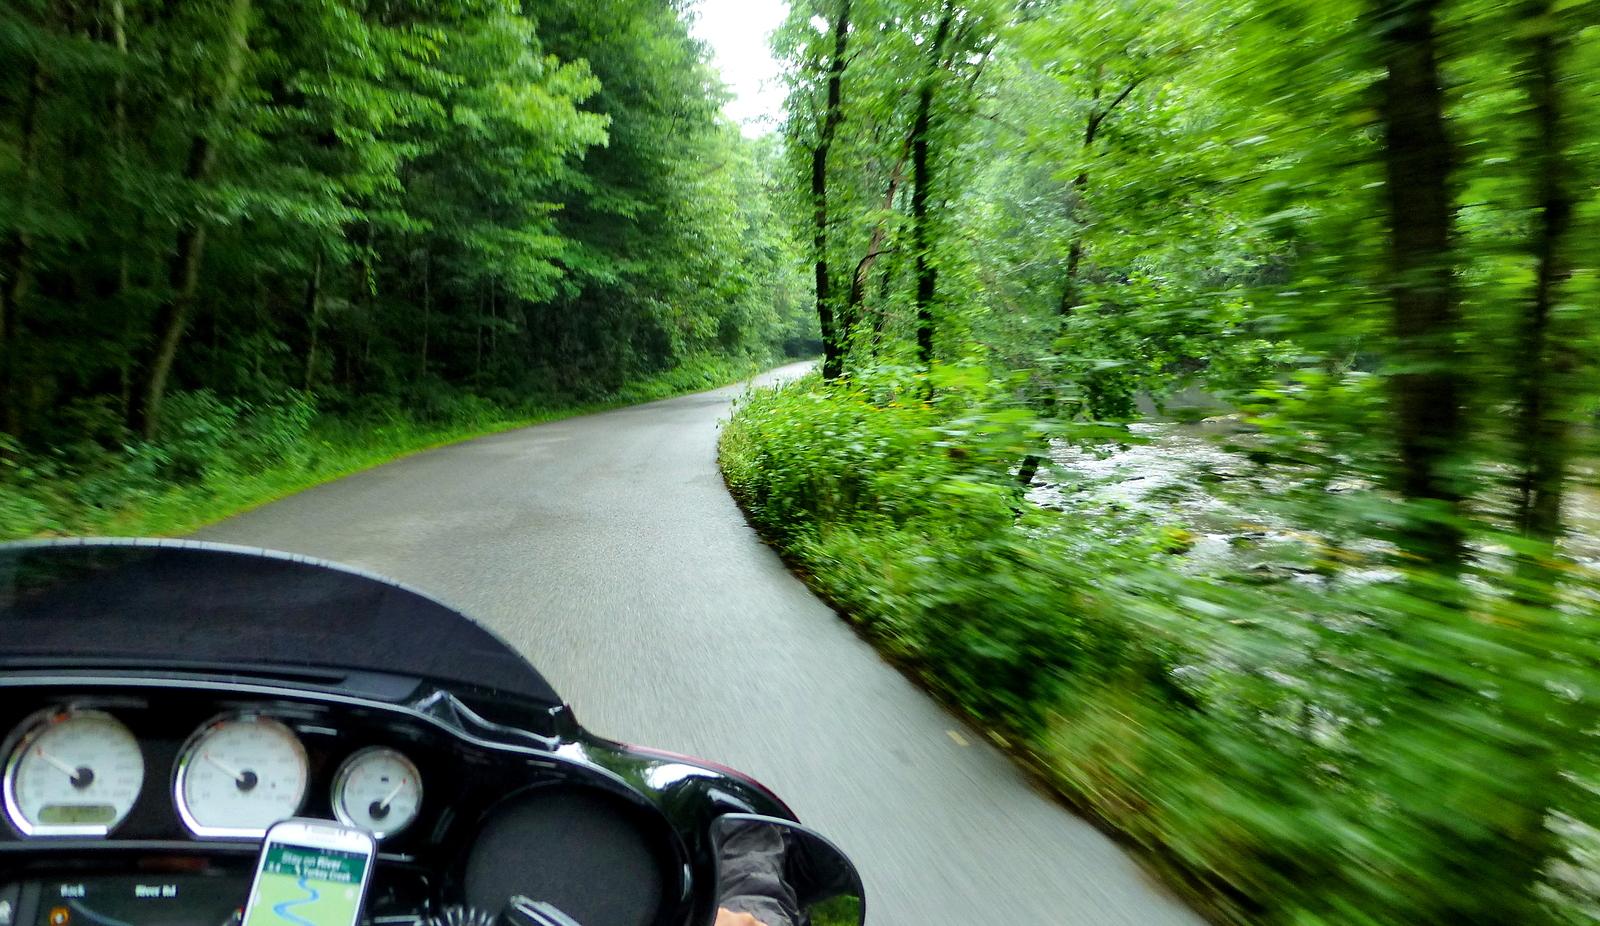 Examen de conduite moto théorique